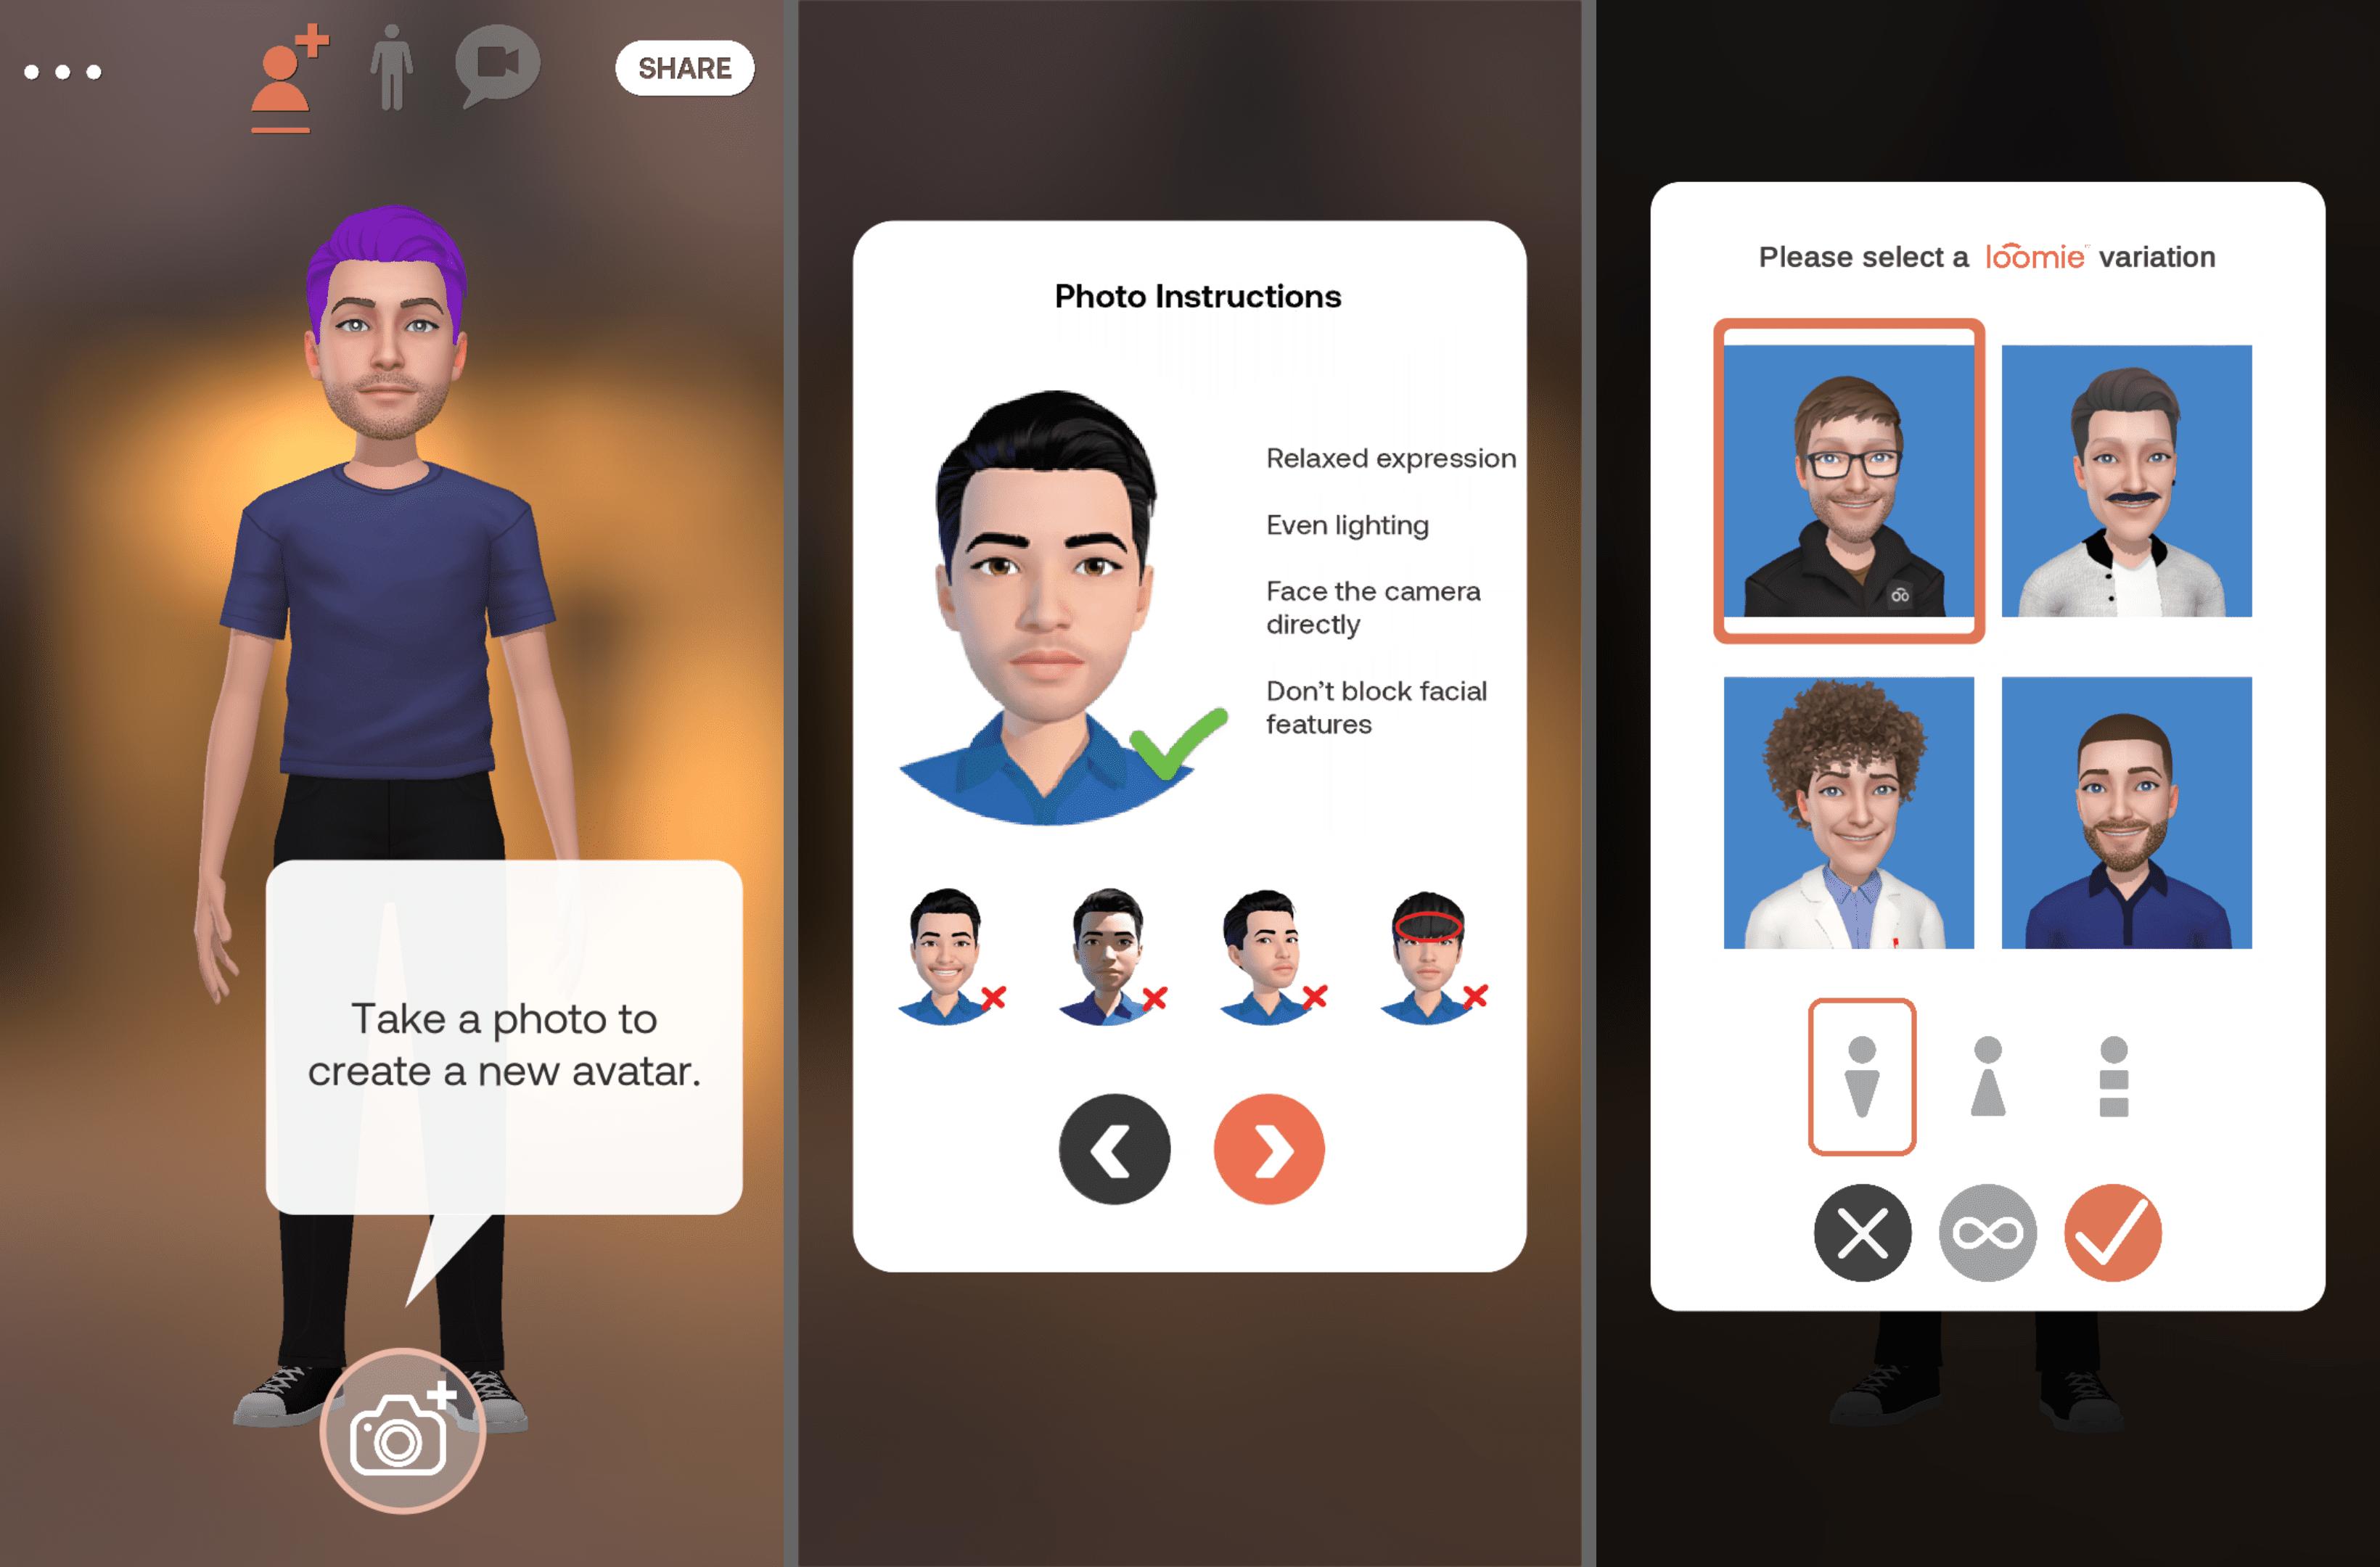 Loomie avatar on the Android app